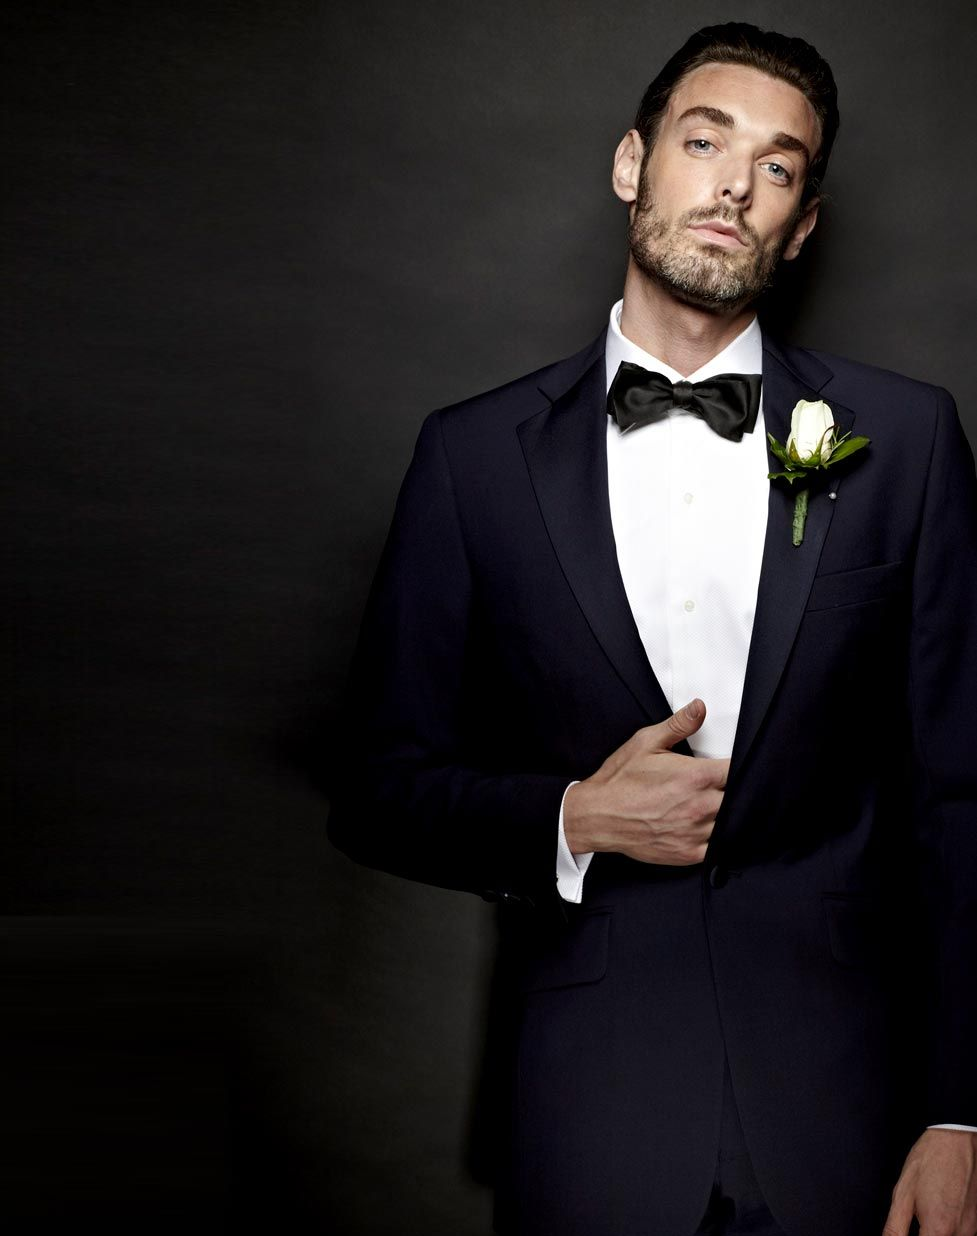 About norton u townsend bespoke tailors in london leeds